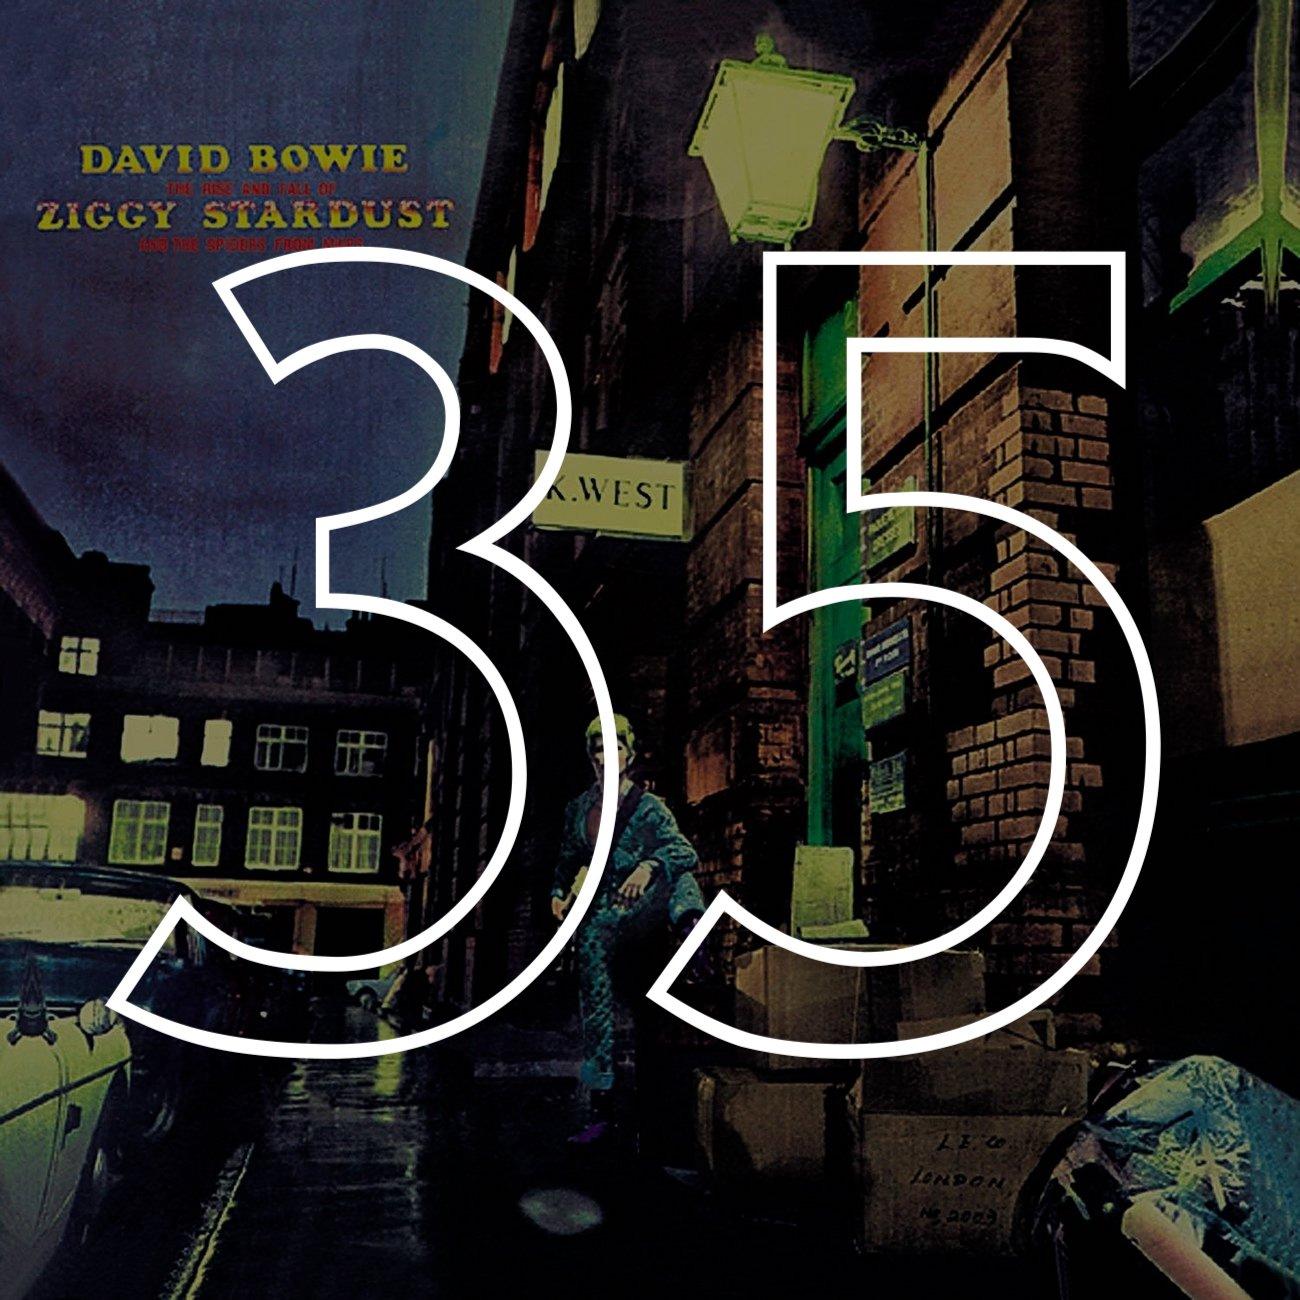 35 Ziggy Stardust.jpg